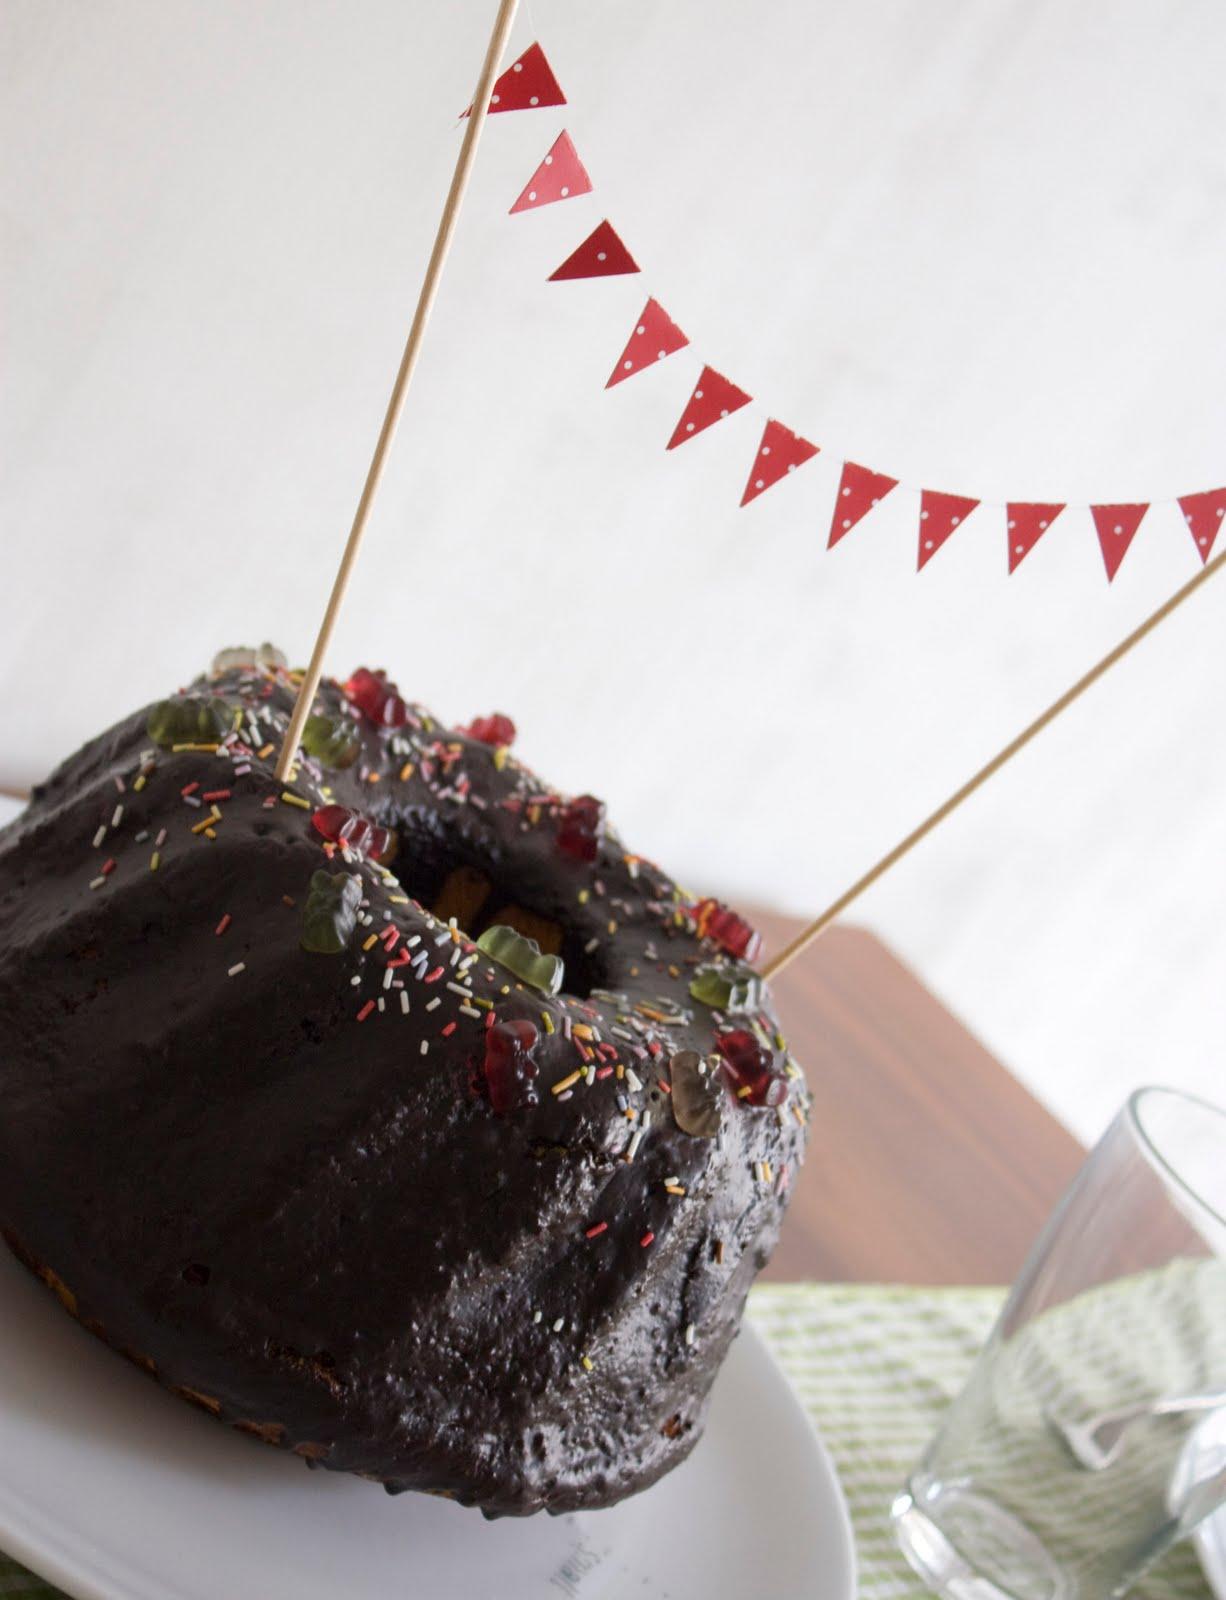 kindergeburtstag on pinterest rezepte torte and kuchen. Black Bedroom Furniture Sets. Home Design Ideas